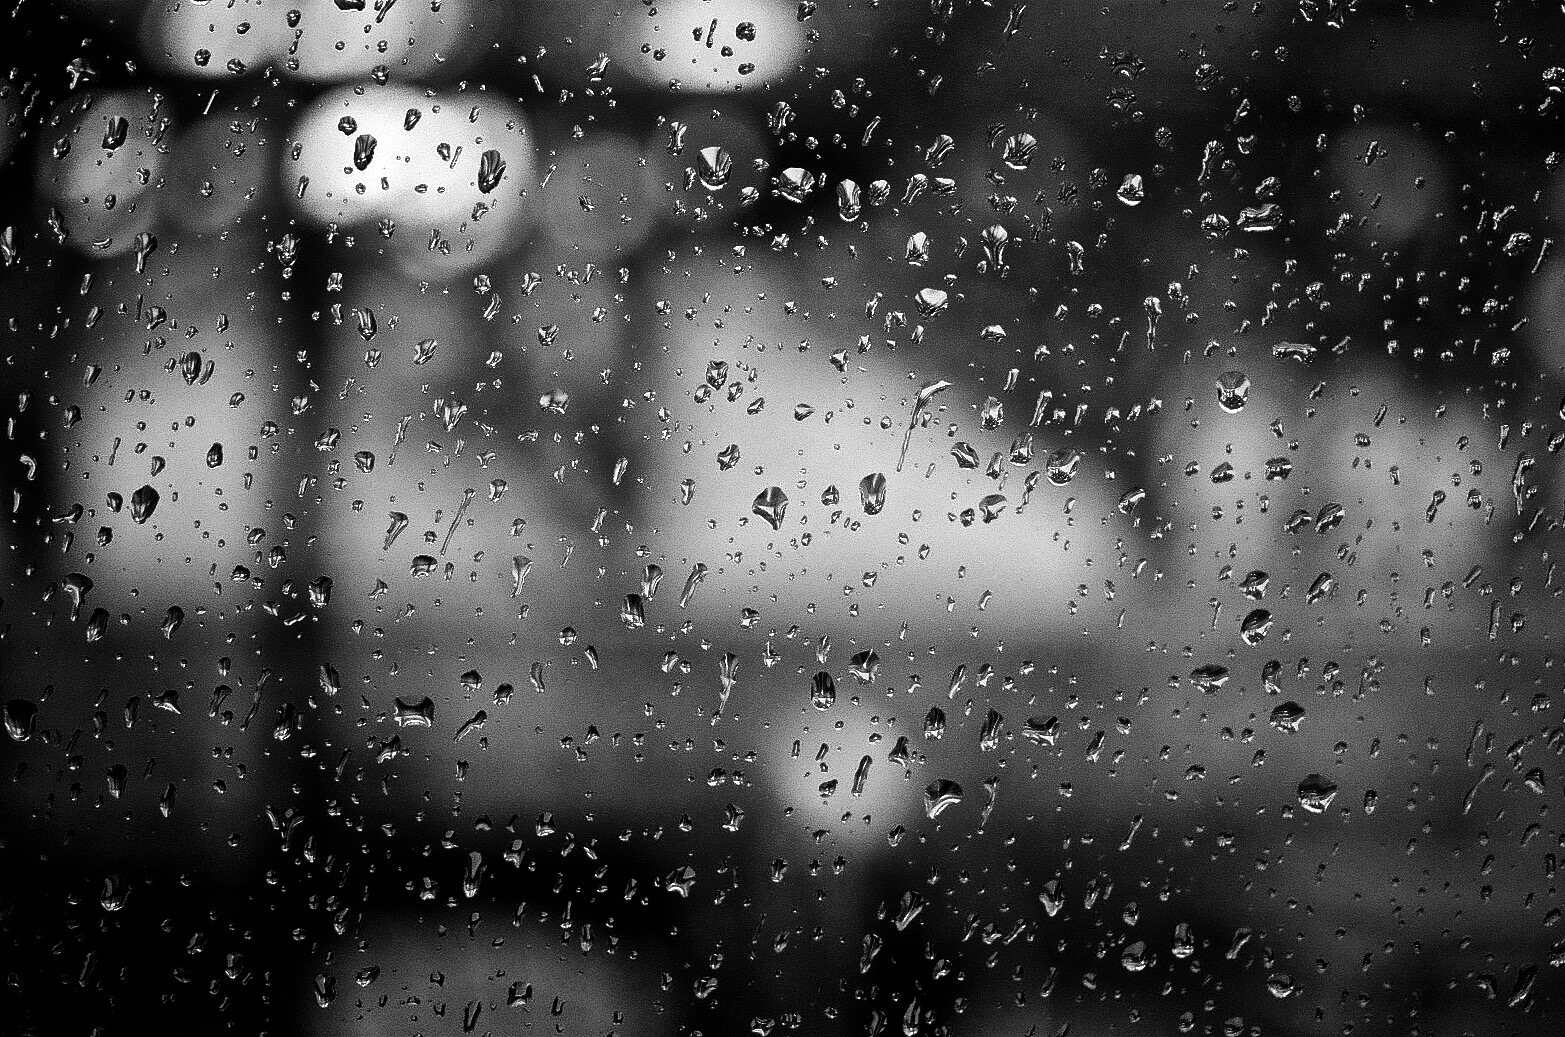 Rainy Day, Nikon F2, 55mm f/2.8 Micro-Nikkor